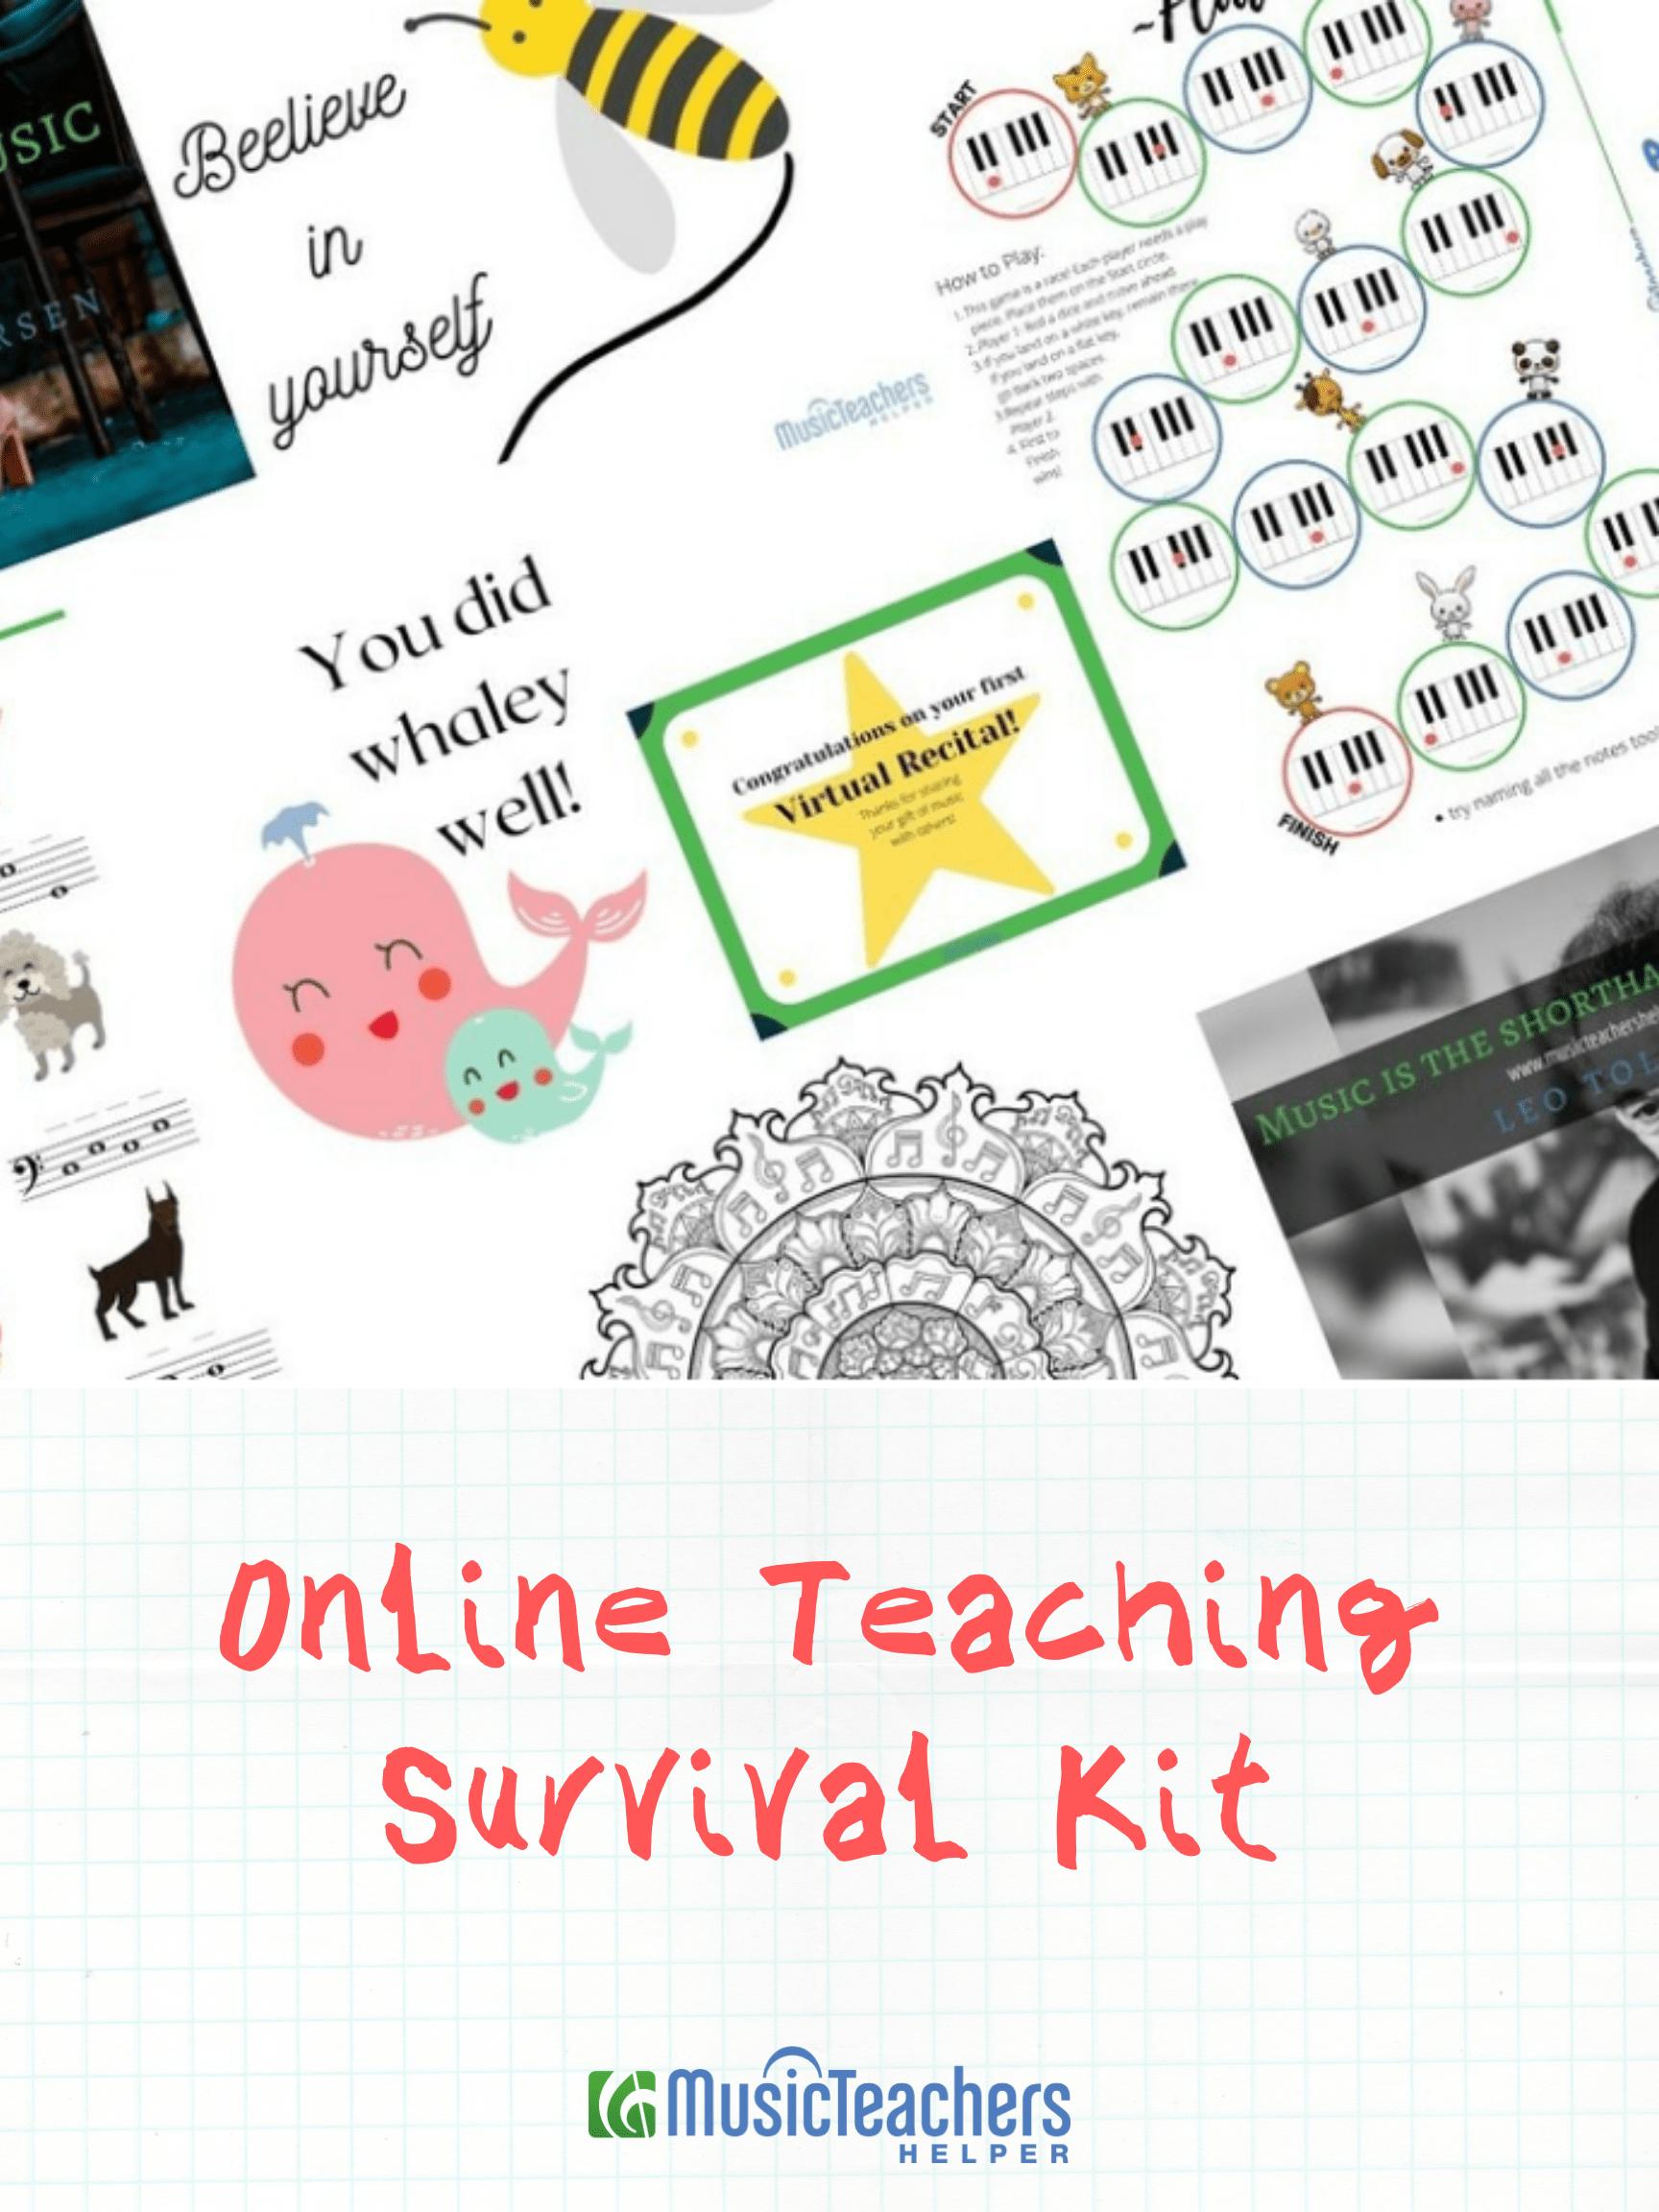 Online Survival Kit Graphic